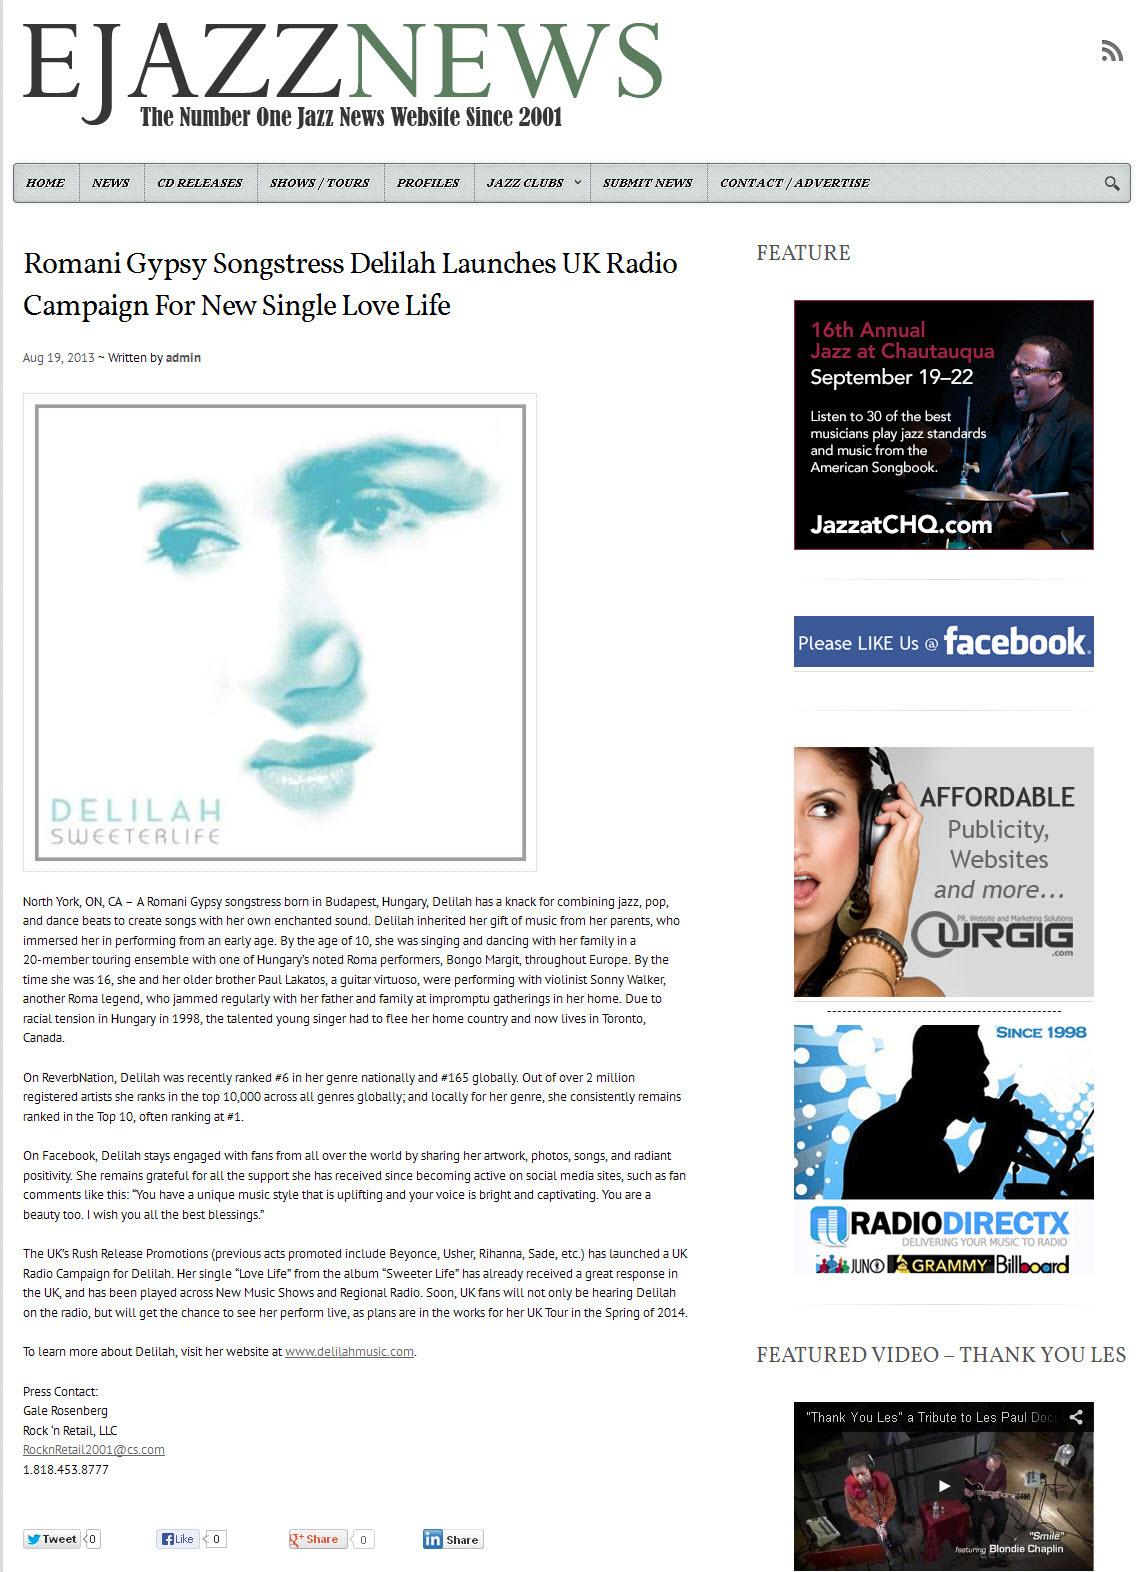 Delilah PR on EJazzNews